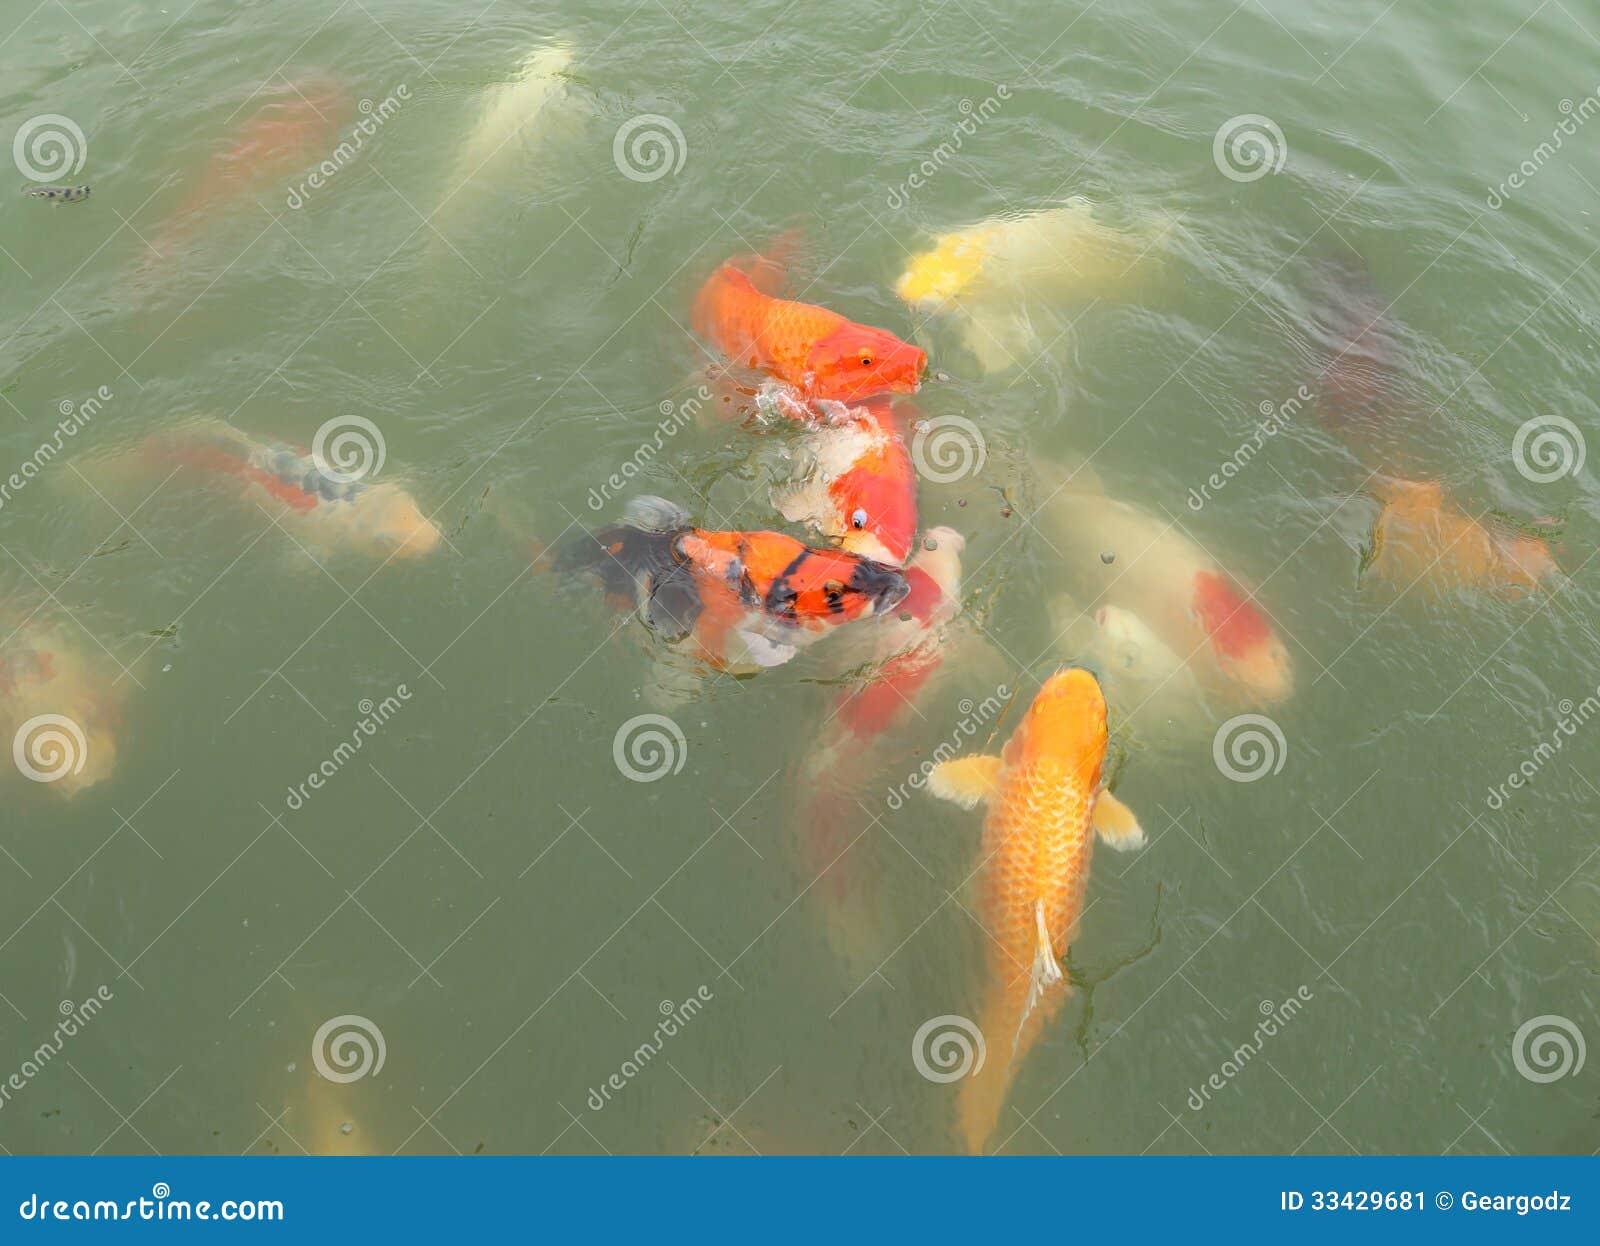 Beautiful koi fish swimming stock image image 33429681 for Beautiful koi fish